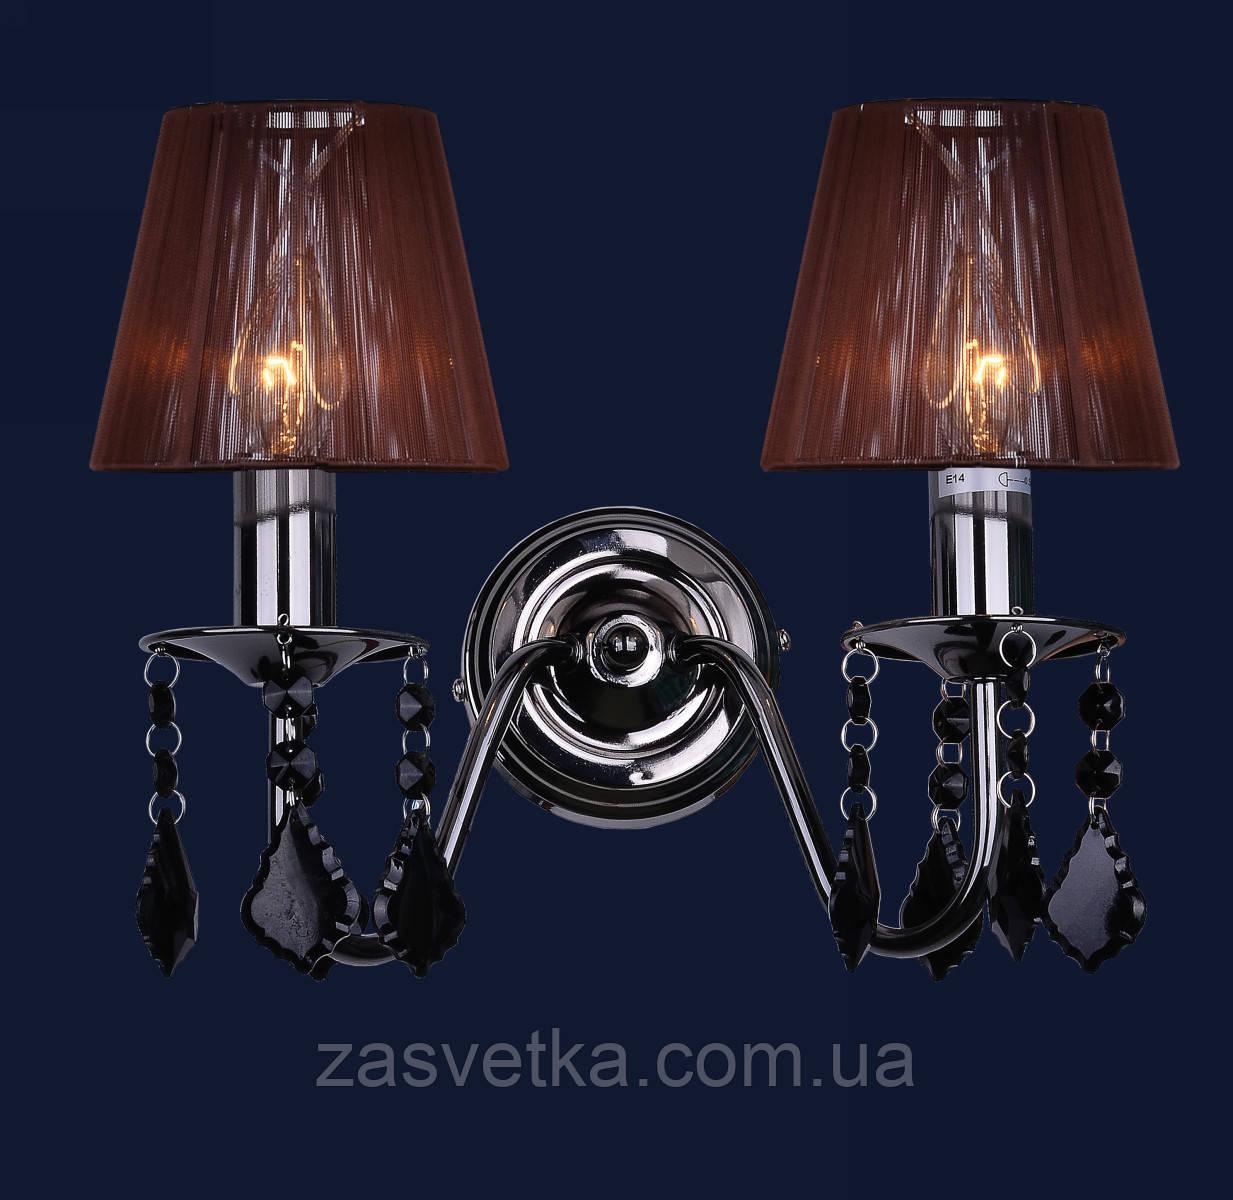 Бра,настенный светильник 720W4002BL-2BL BROWN